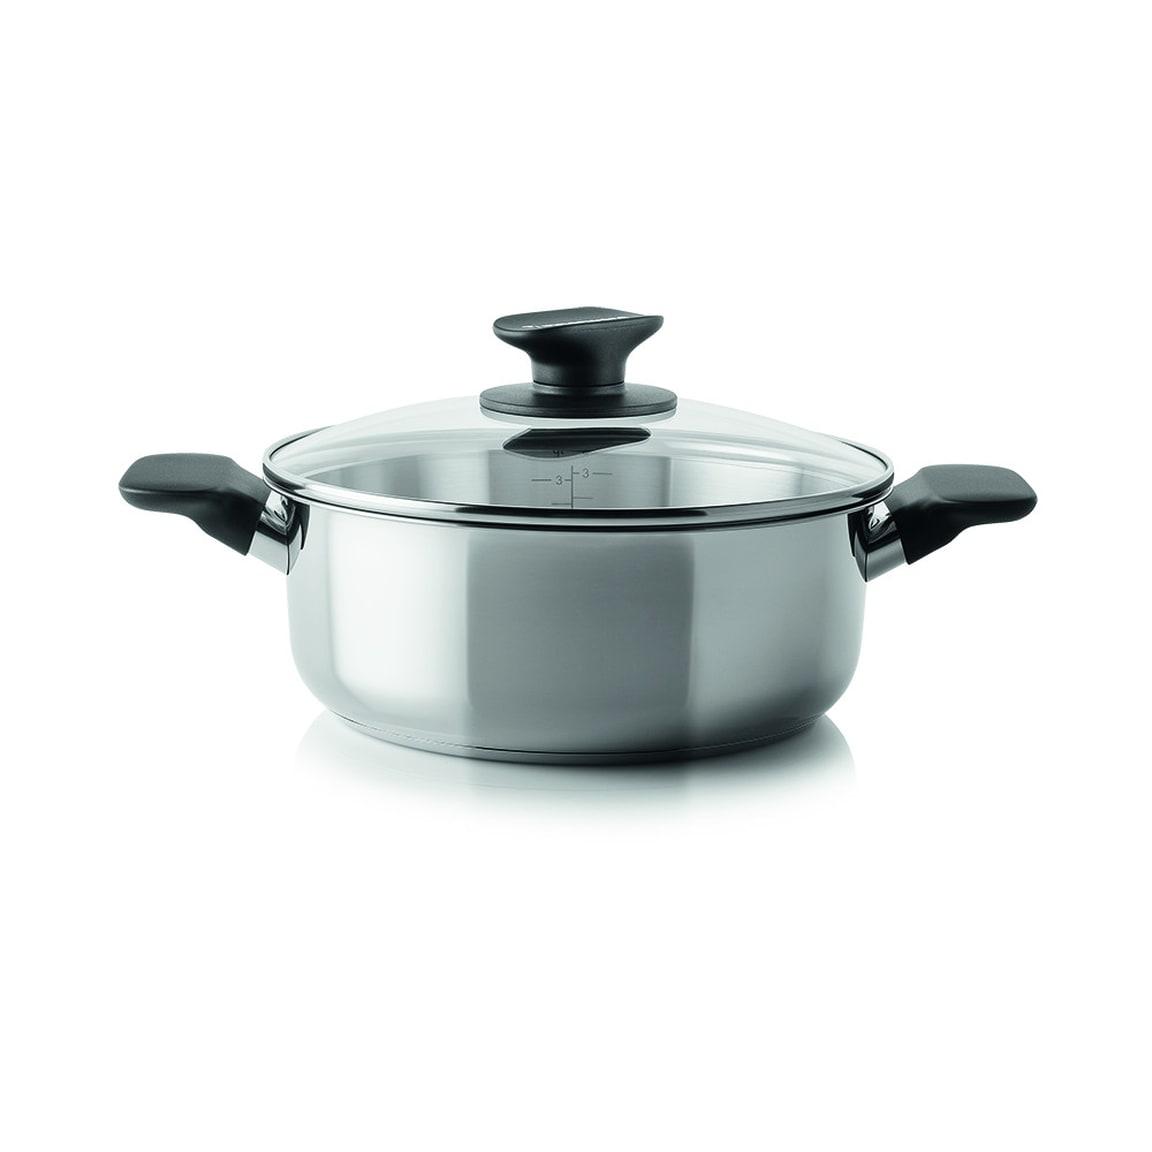 Universal Cookware Stockpot 4.0L